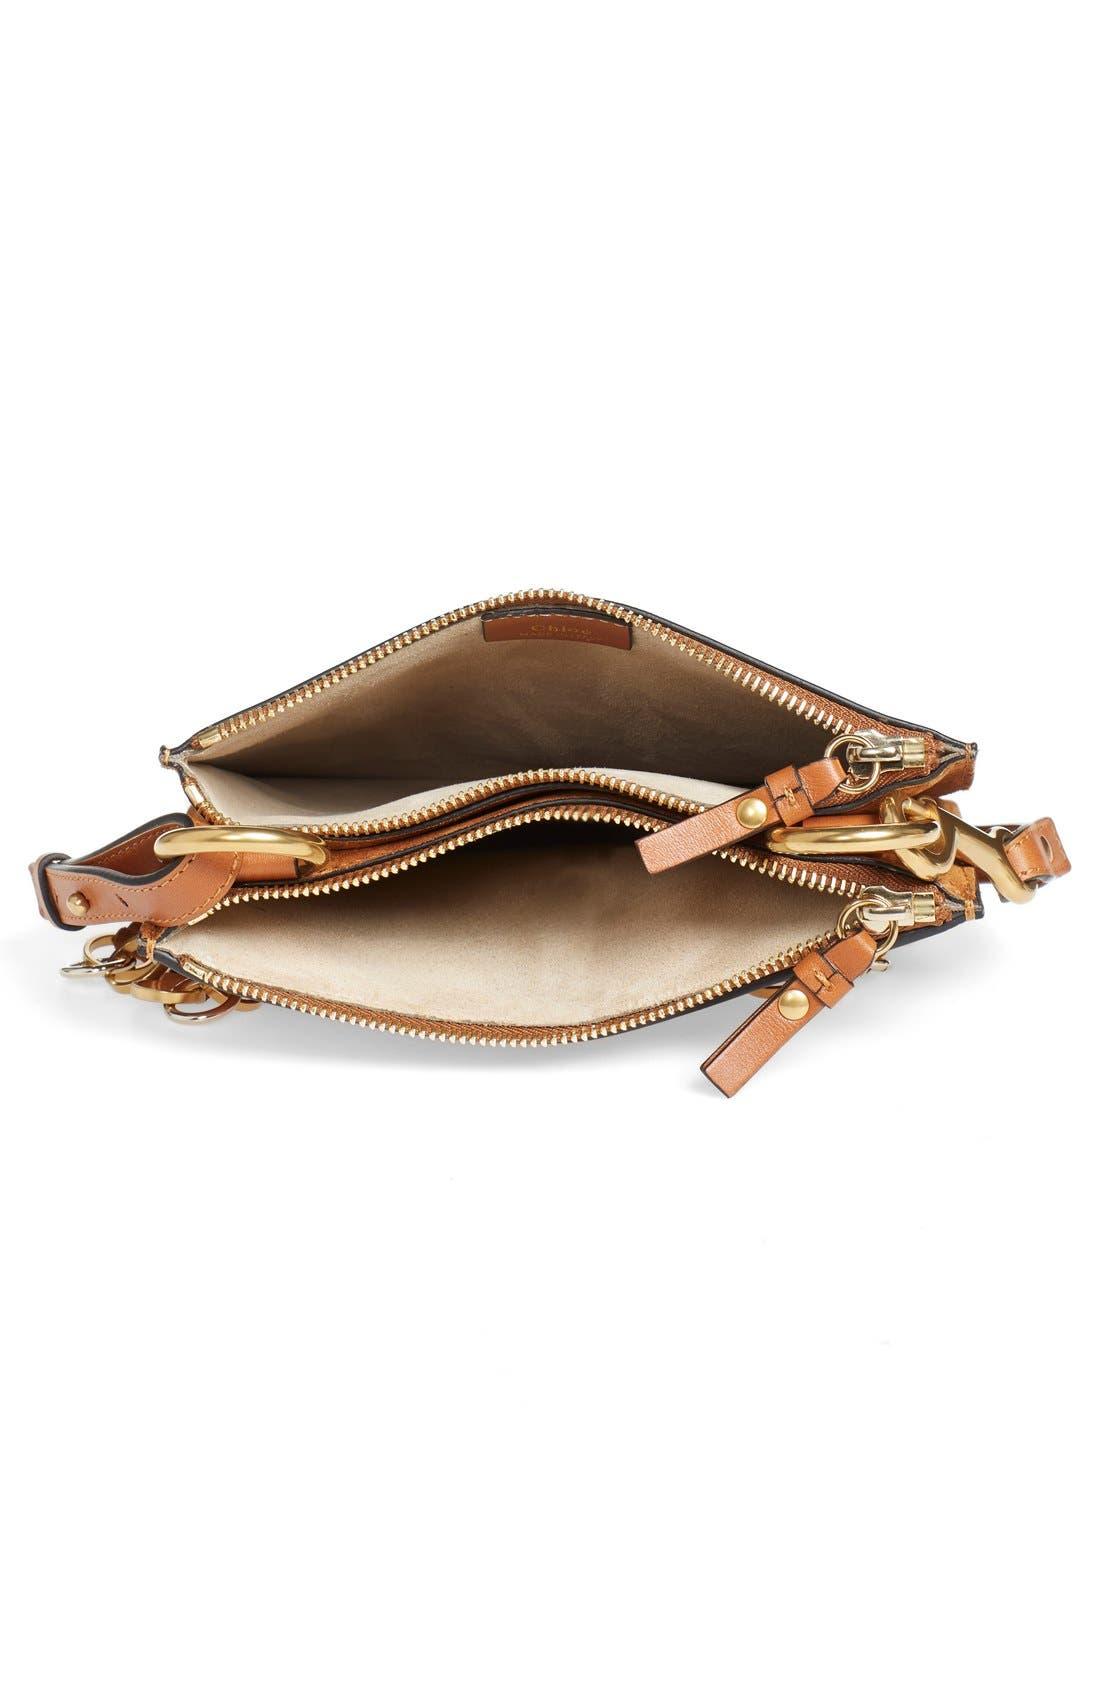 Alternate Image 3  - Chloé 'Small Jane' Tassel Suede & Leather Crossbody Bag